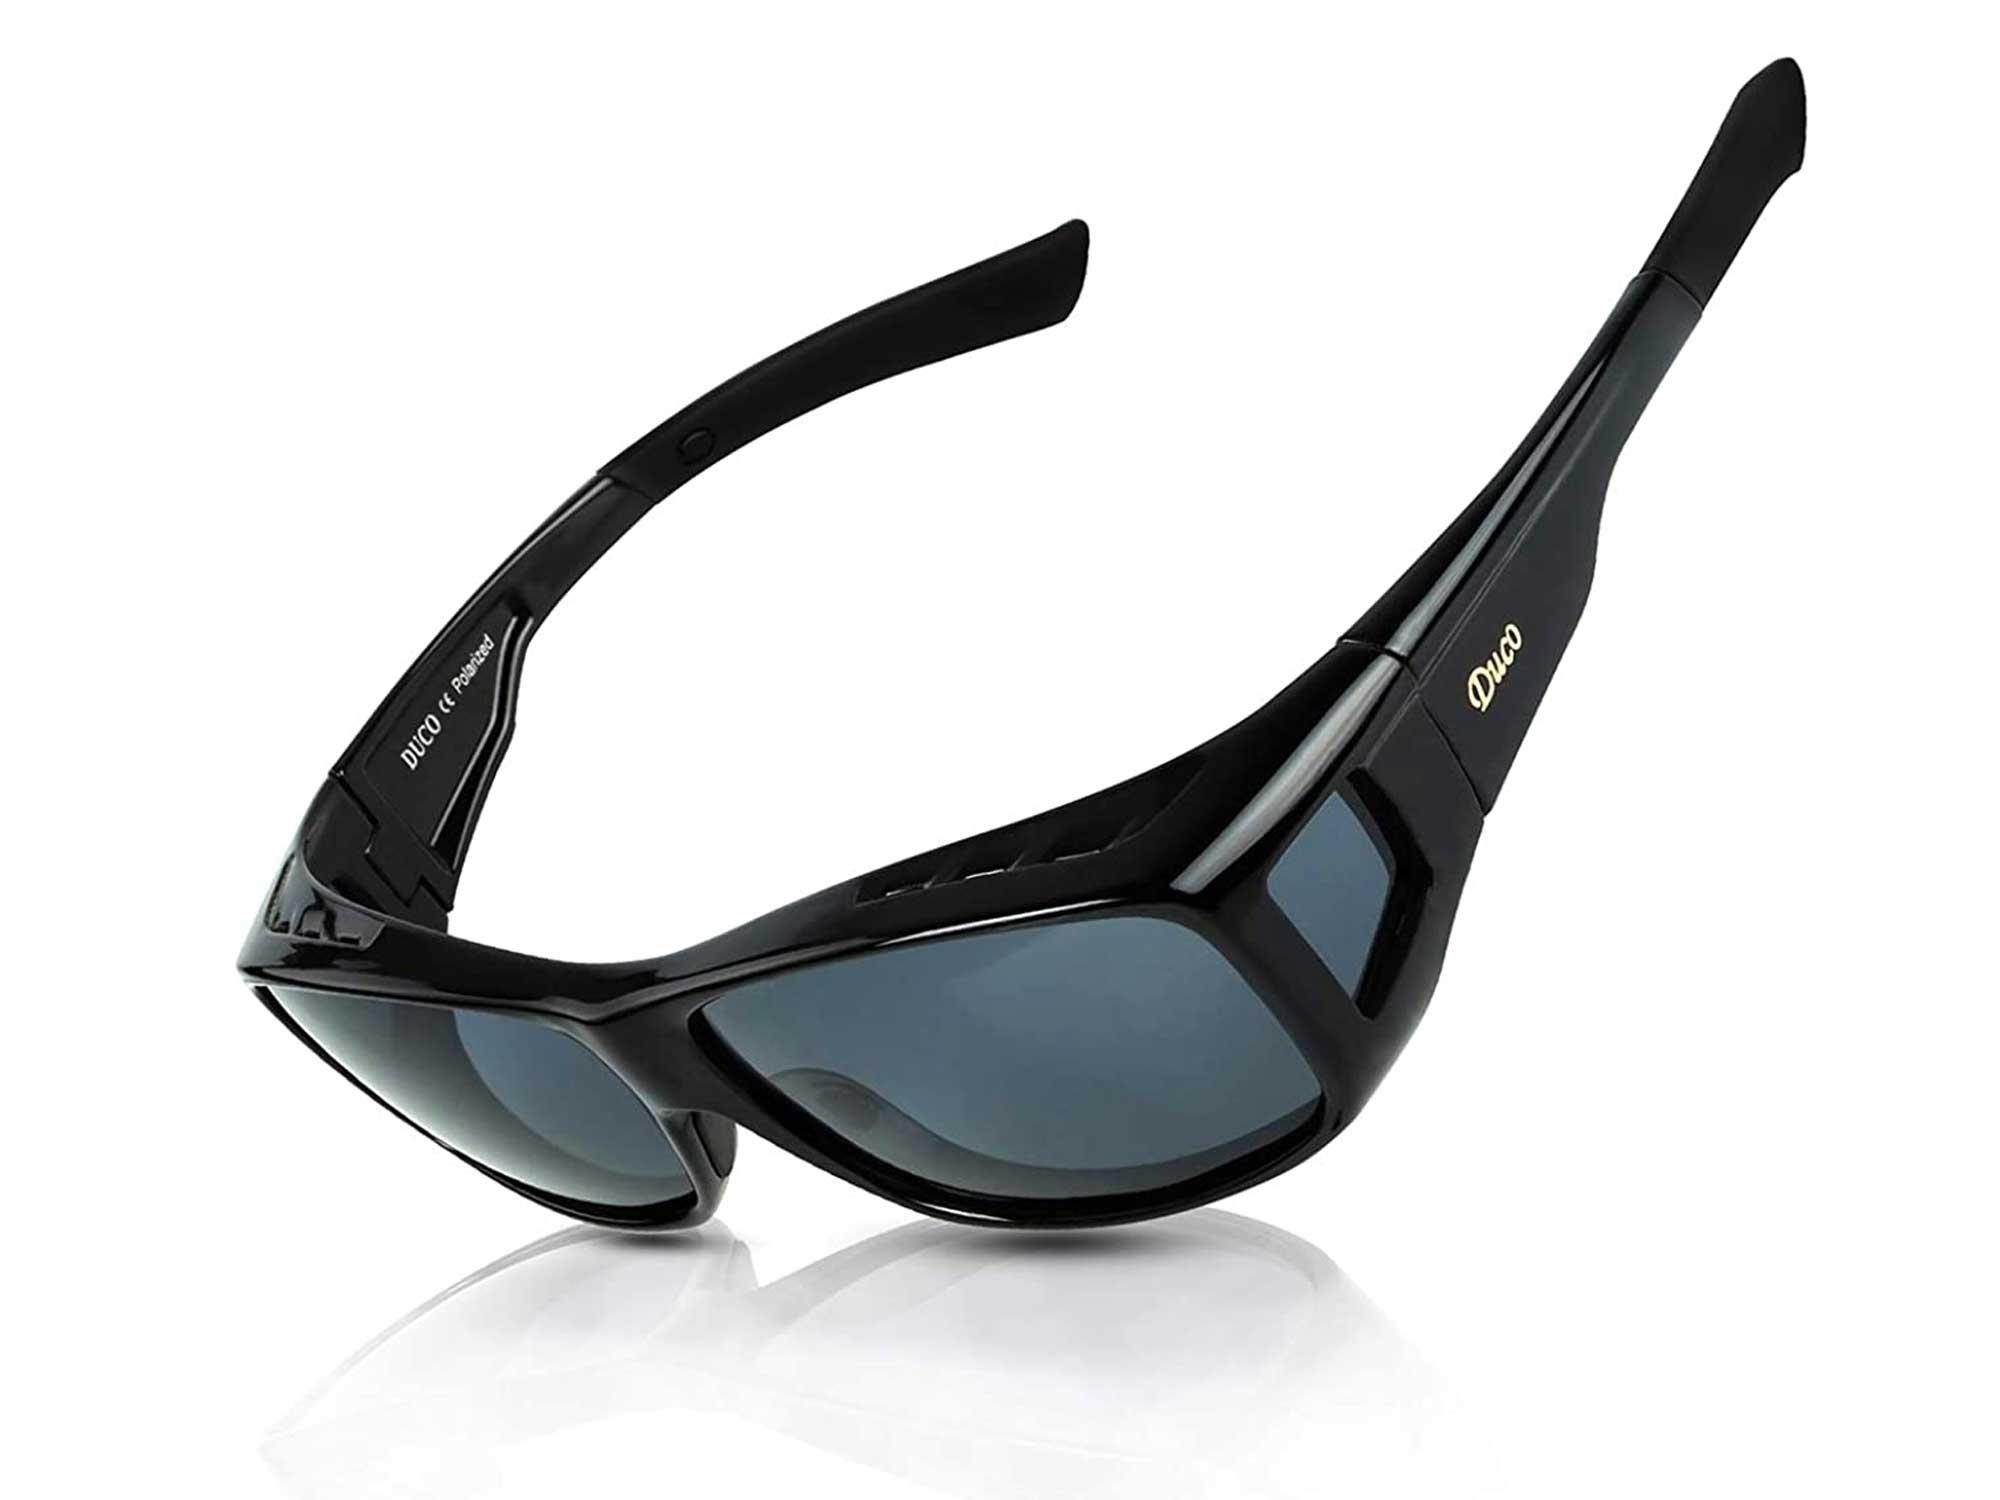 DUCO Unisex Wraparound Fitover Glasses Polarized Wear Over Sunglasses